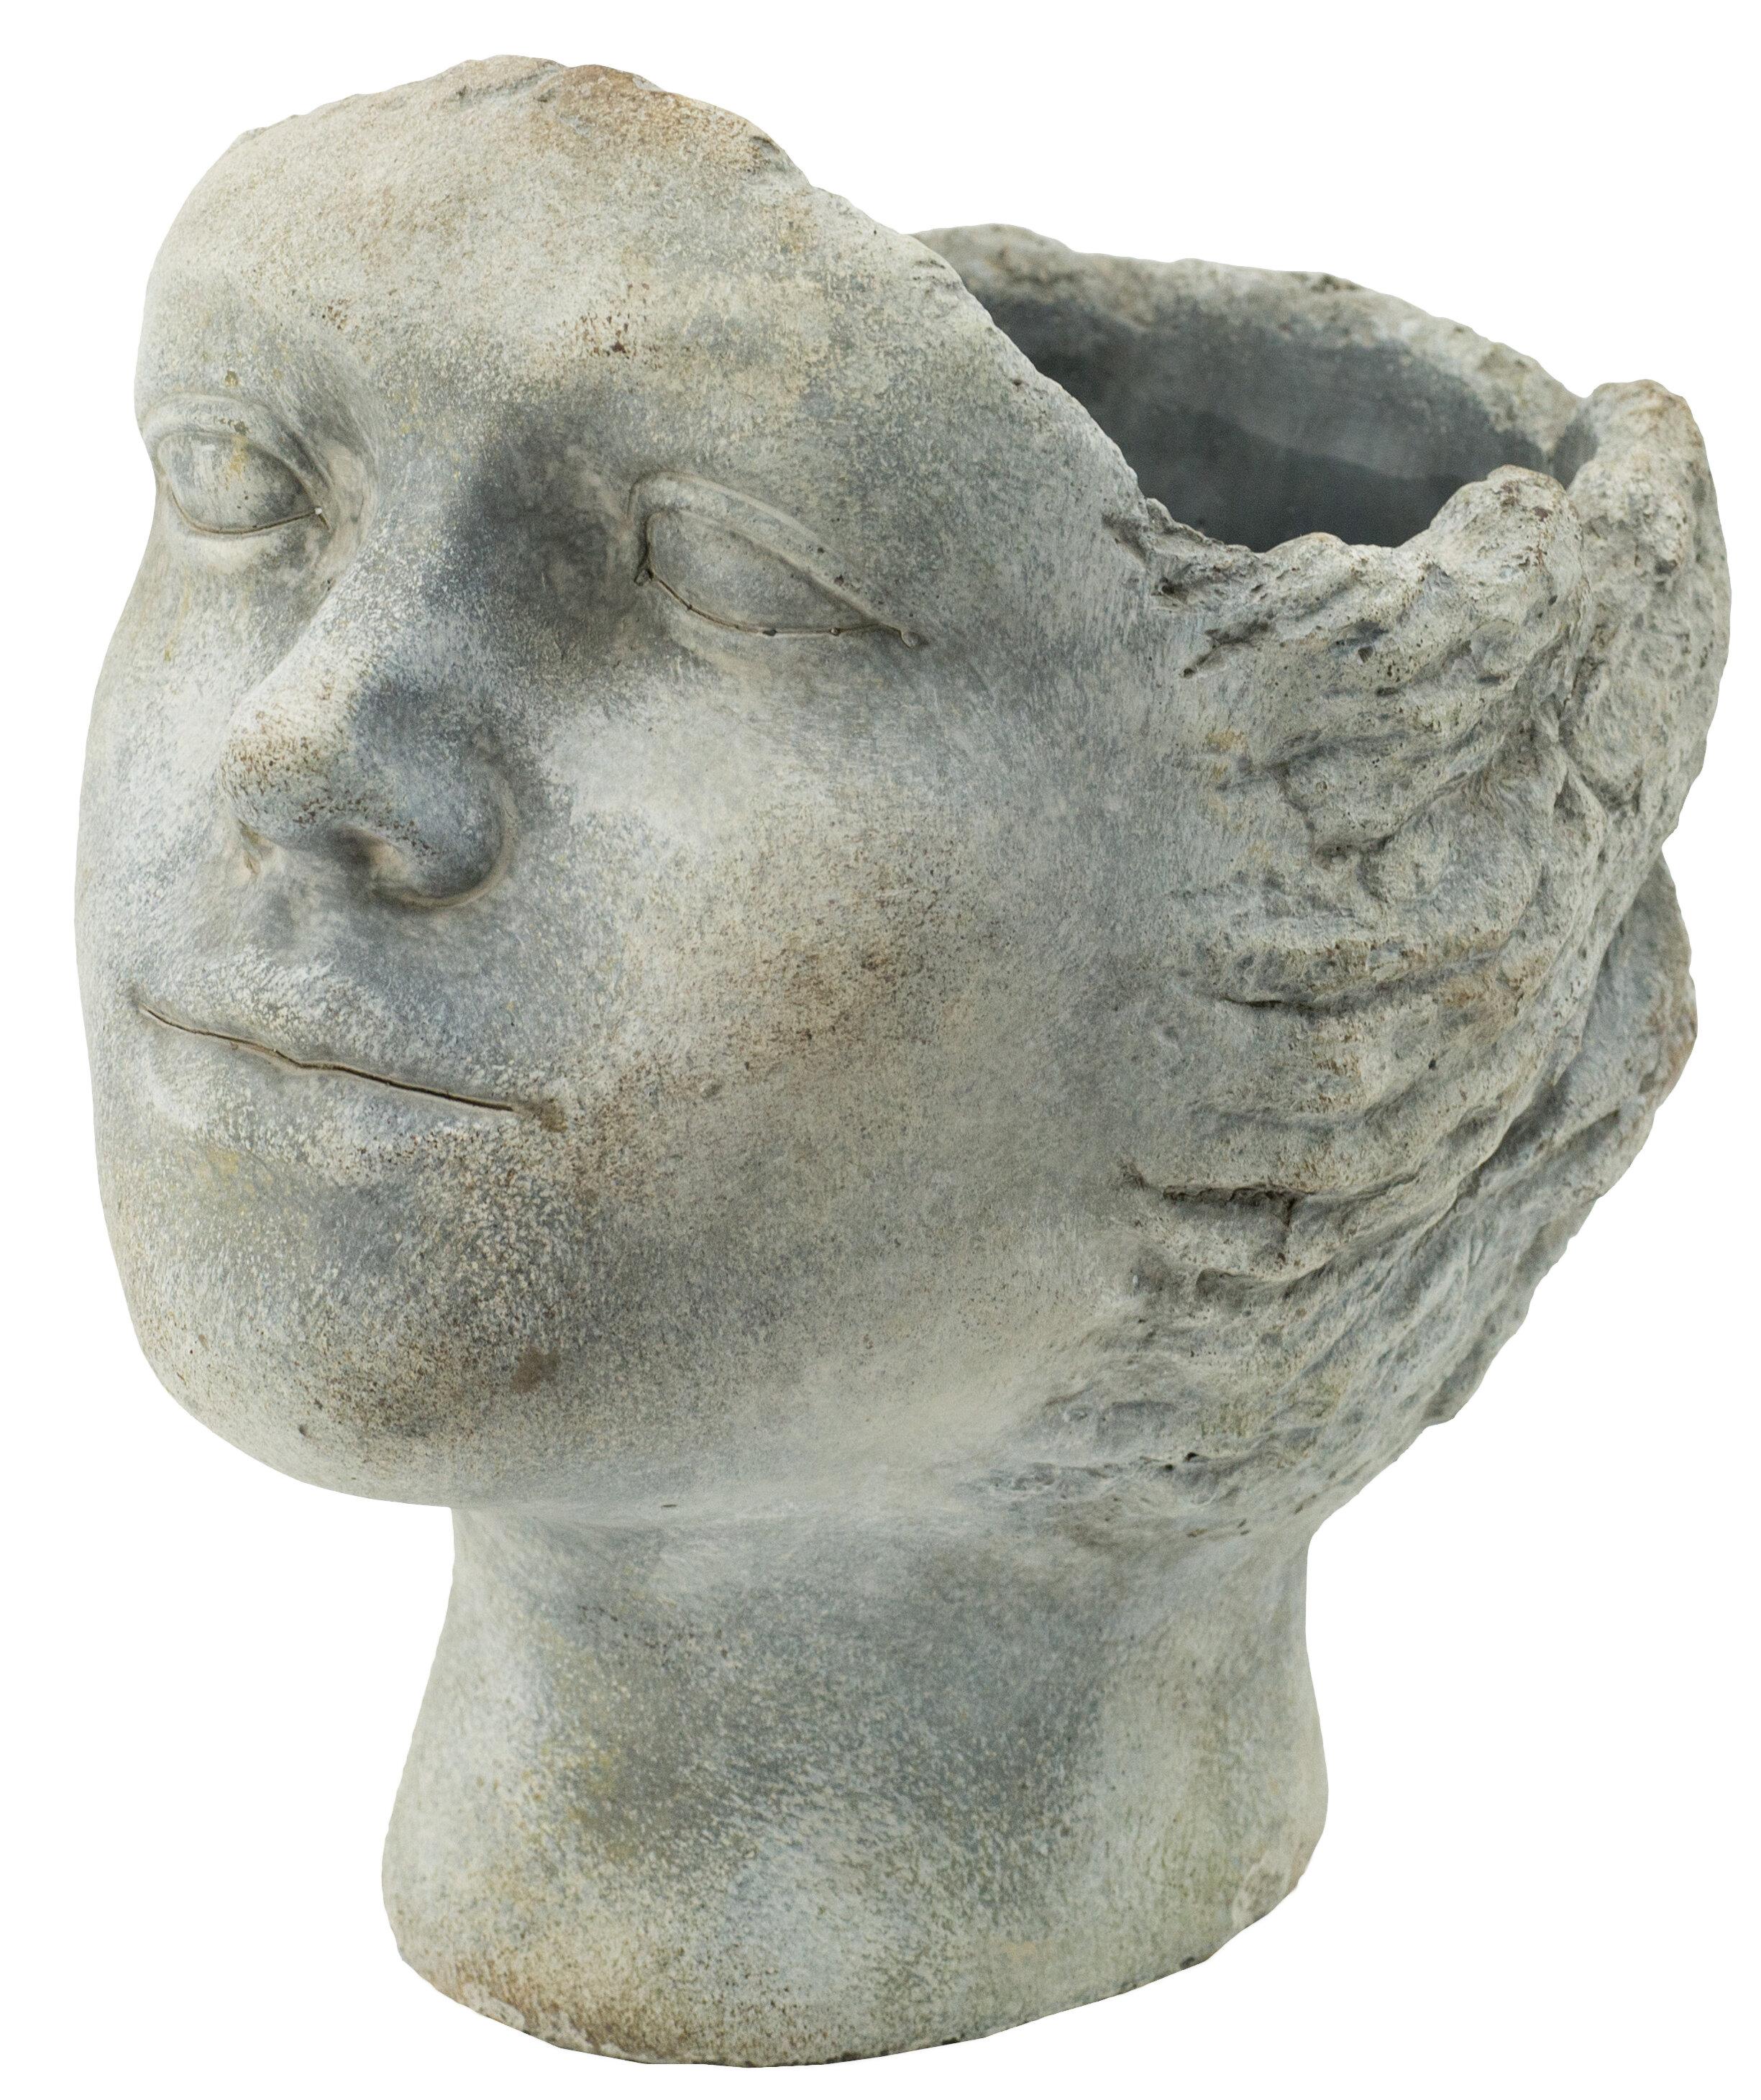 Canora Grey Ladbroke 100 Cement Statue Planter Wayfair